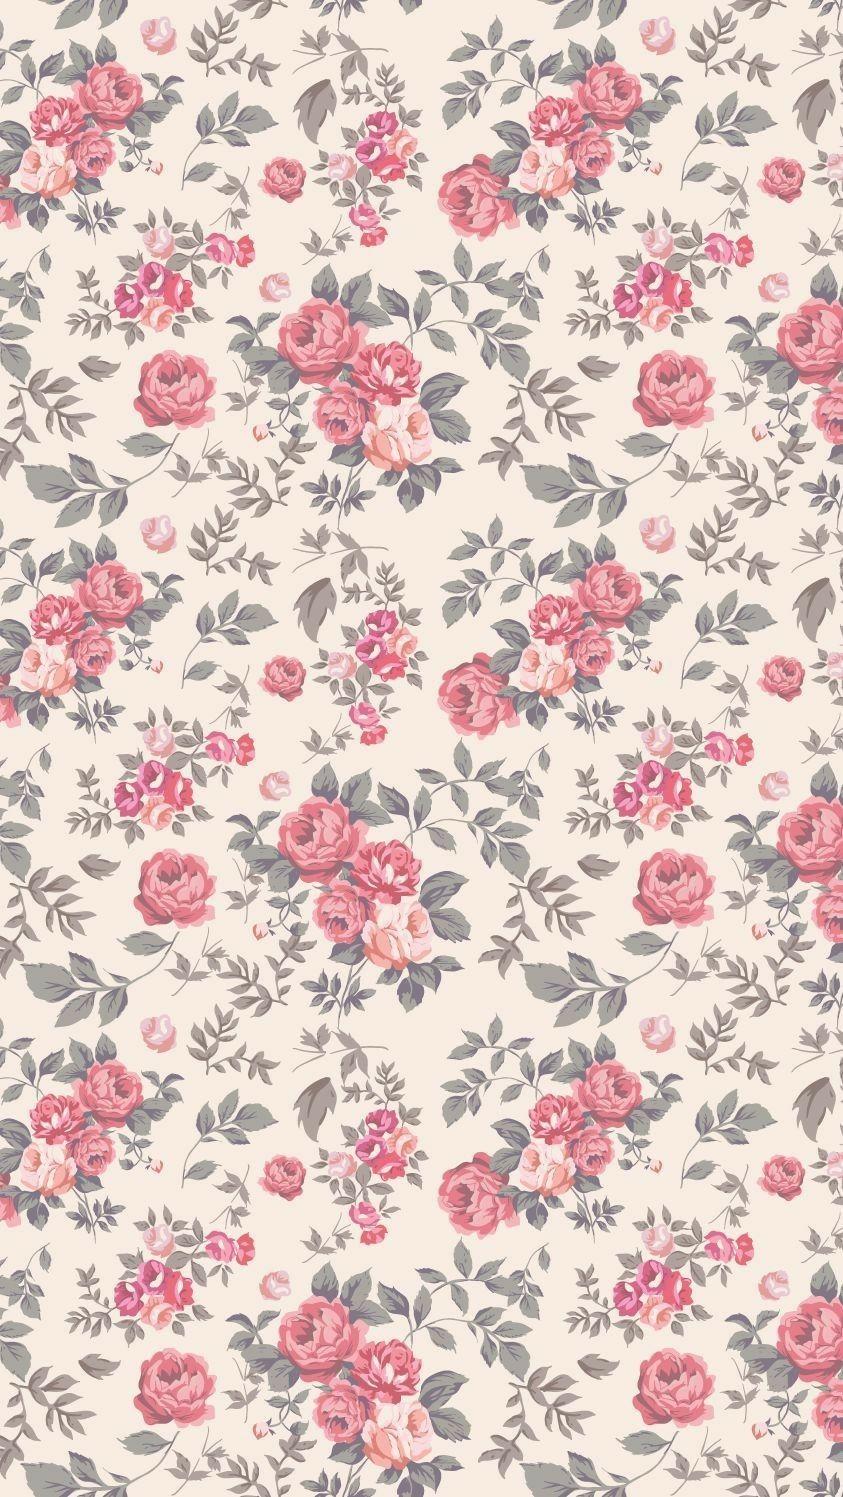 Flores Sfondi Floreali Sfondi Iphone Sfondi Vintage